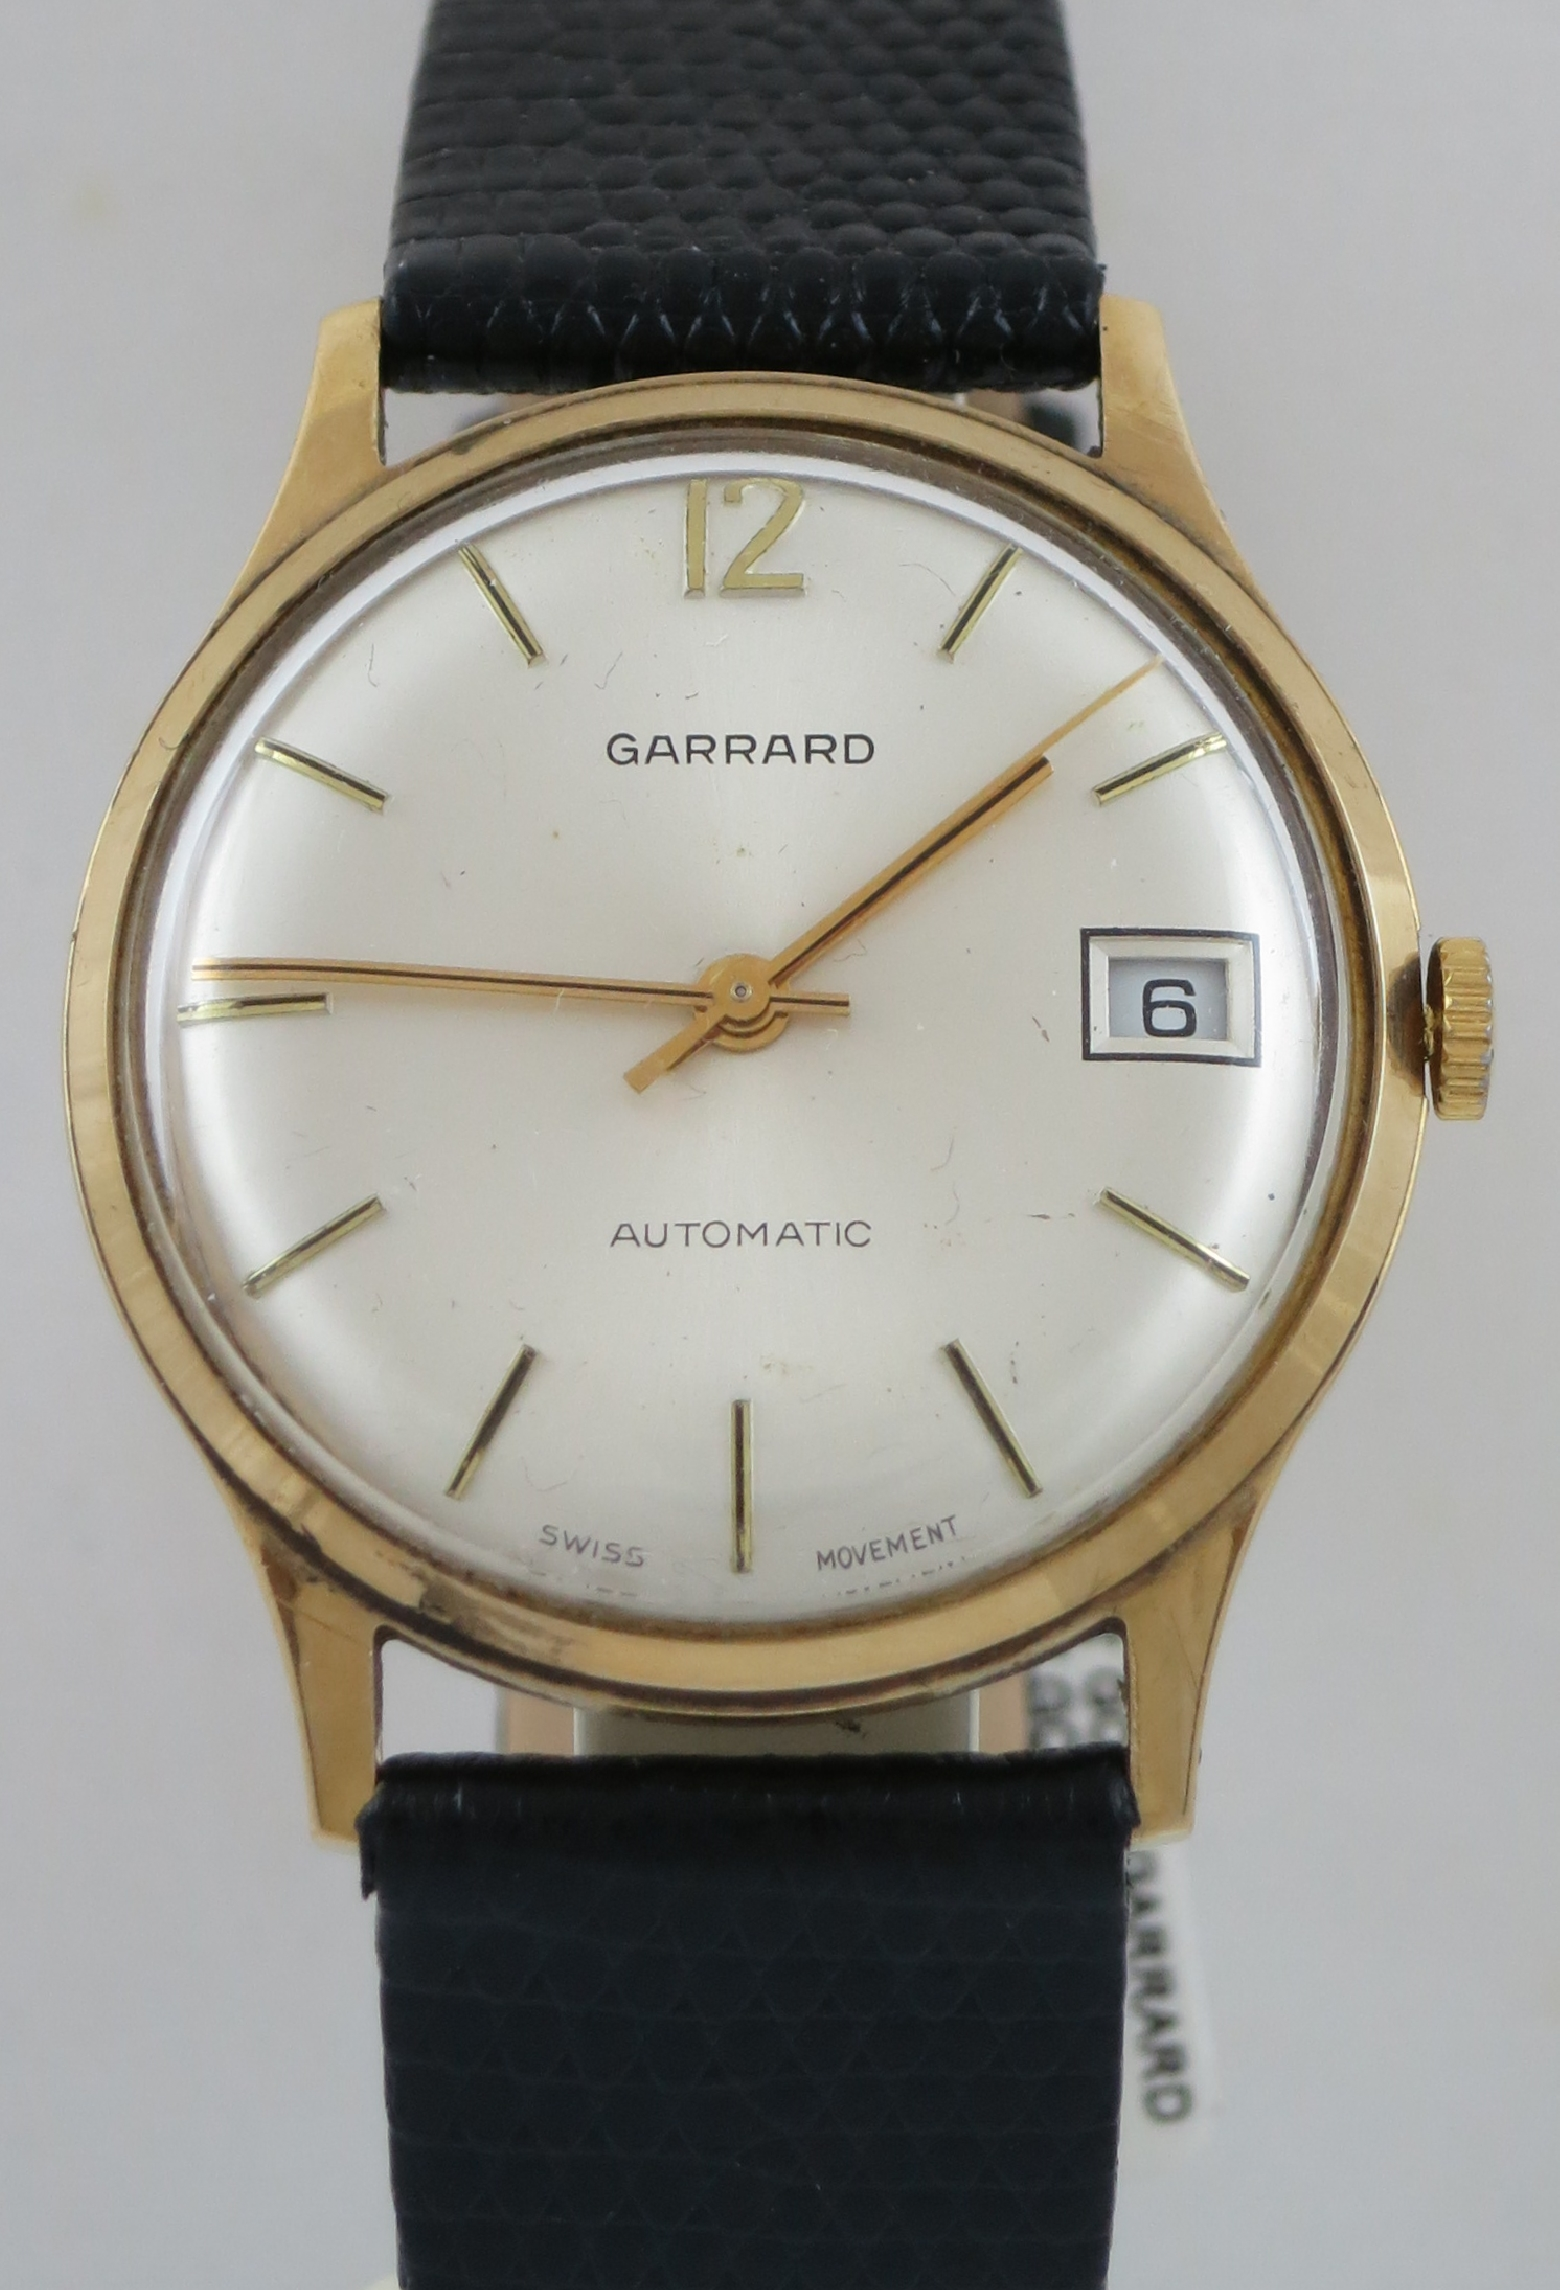 GARRARD AUTOMATIC WATCH 9CT GOLD CASE